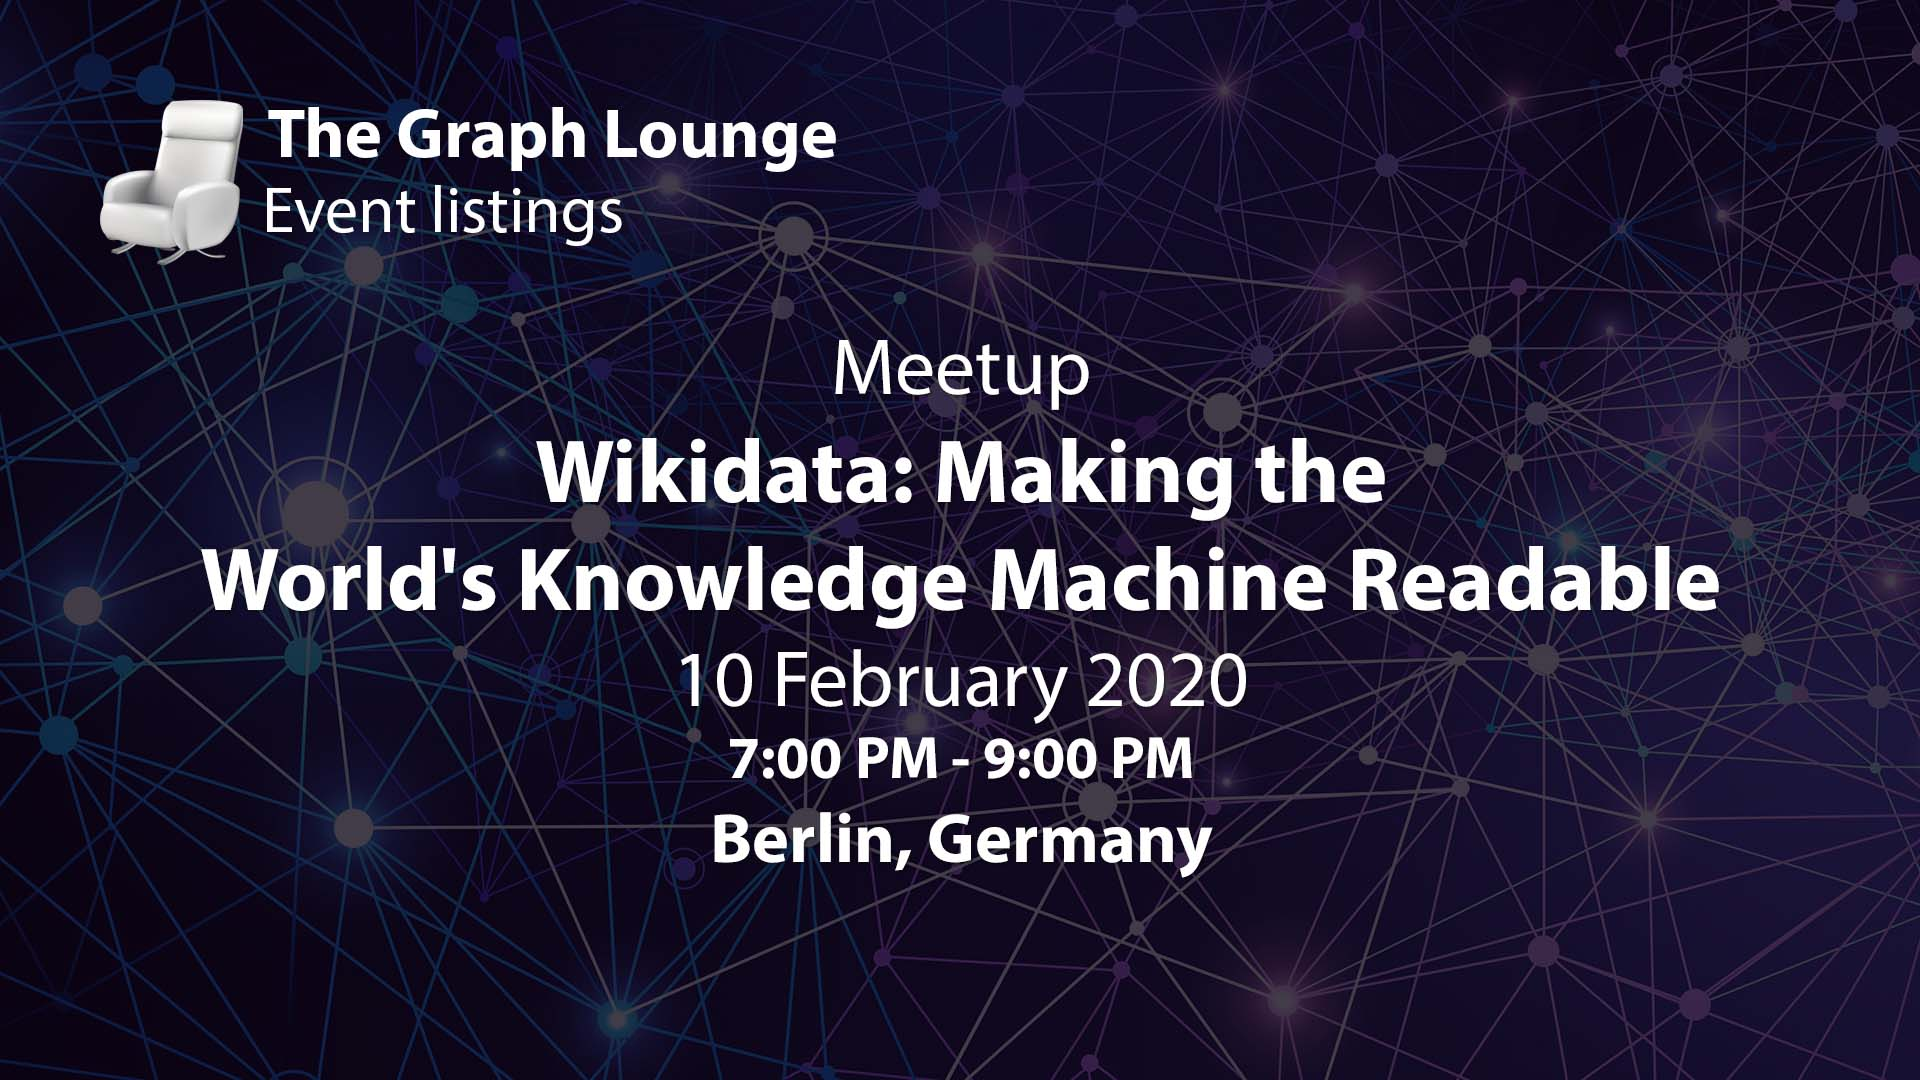 Wikidata: Making the World's Knowledge Machine Readable